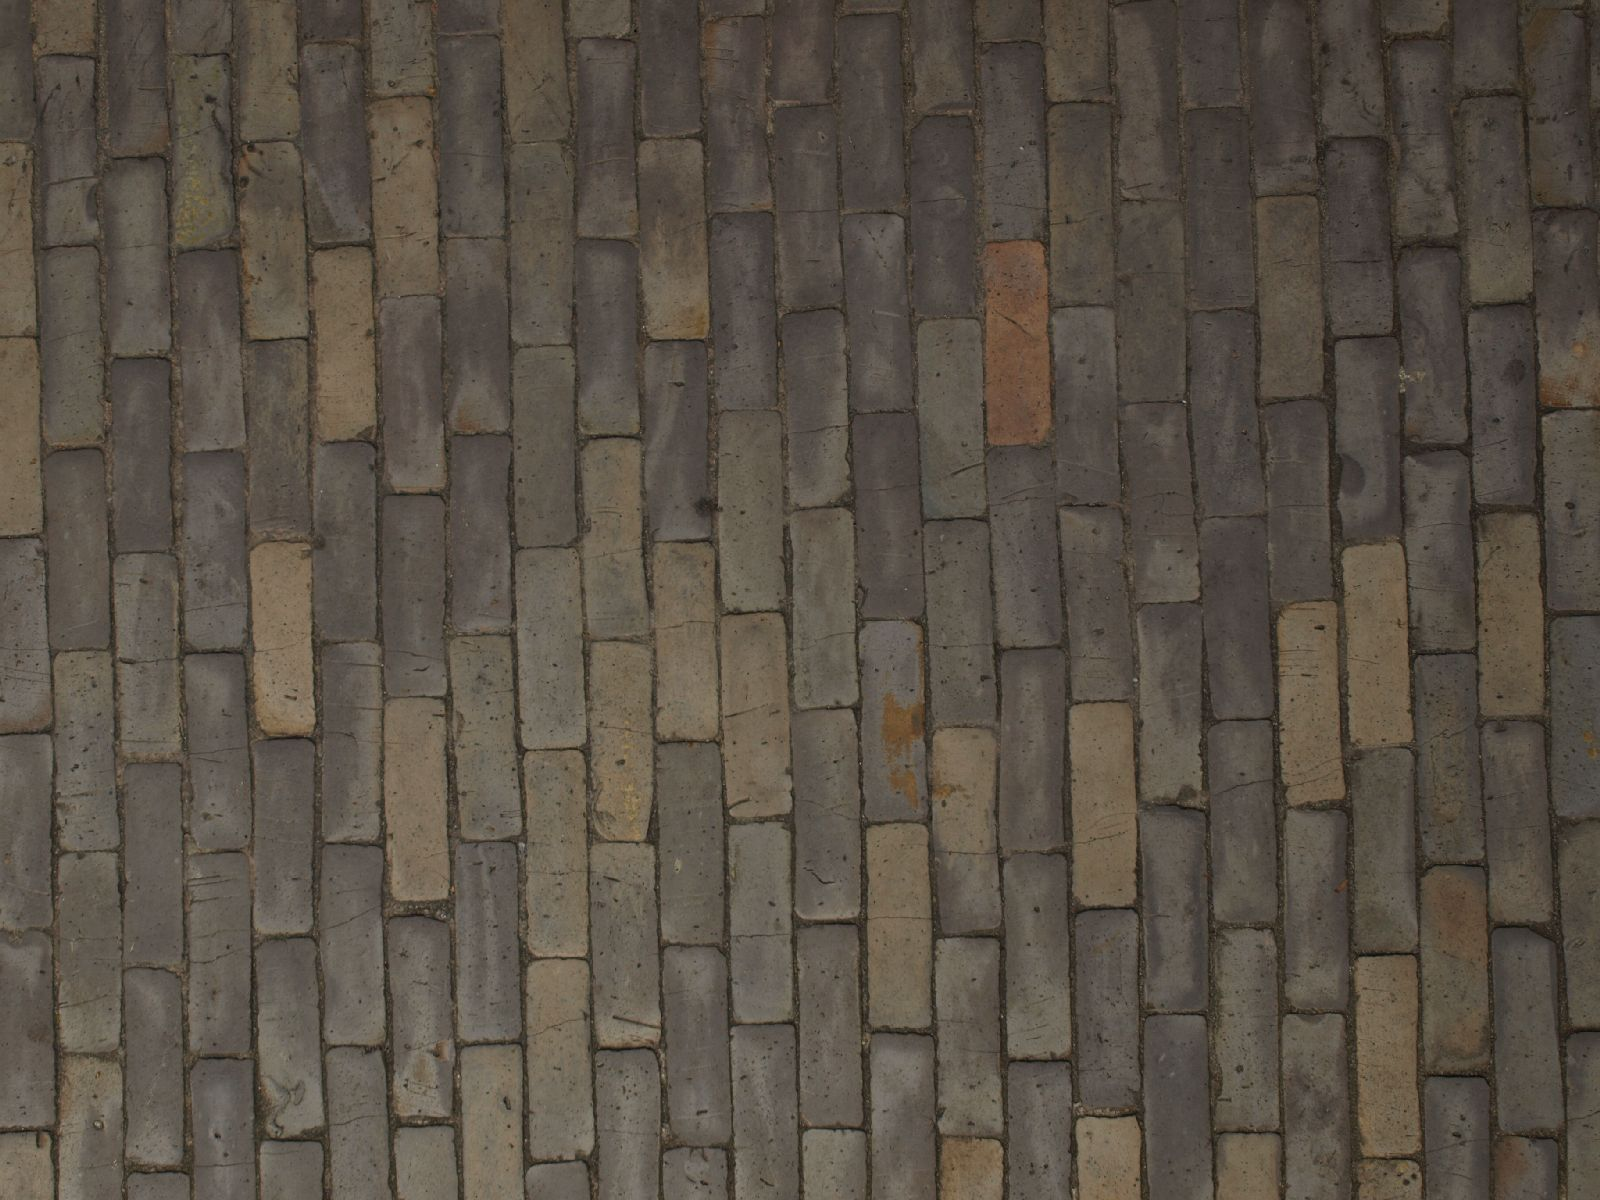 Ground-Urban_Texture_A_PA220390